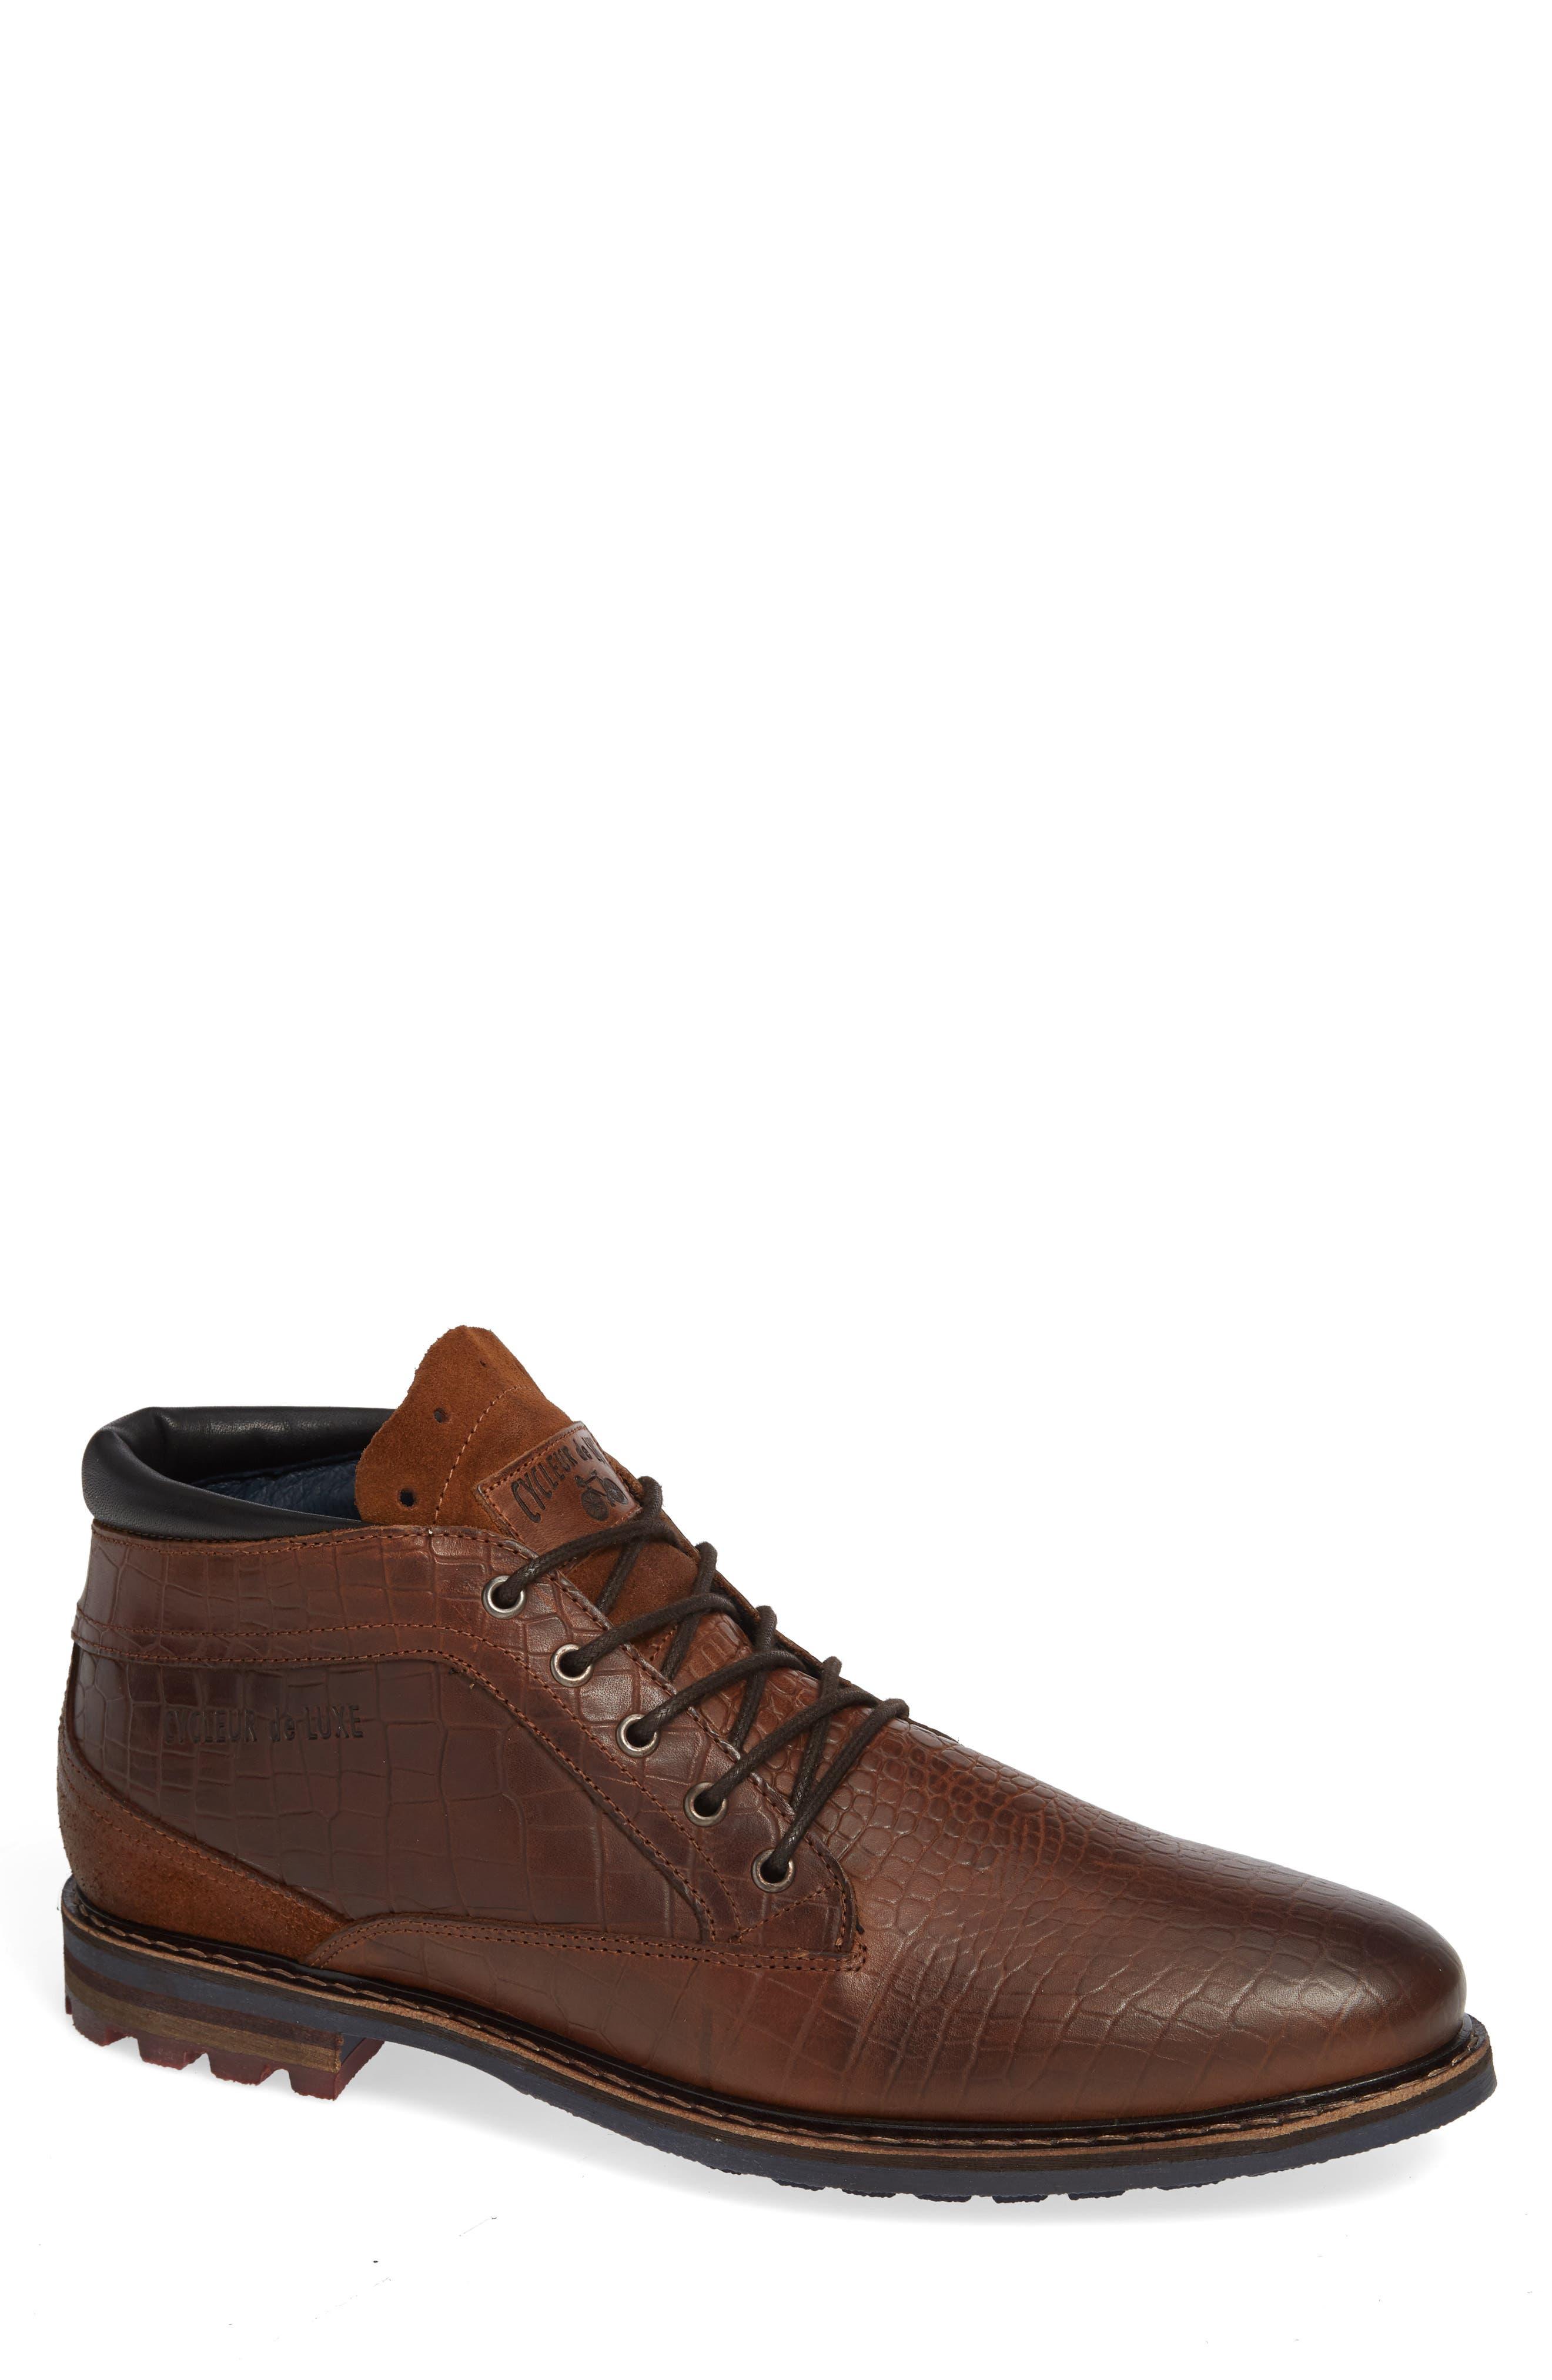 Manton Plain Toe Boot,                             Main thumbnail 1, color,                             COGNAC